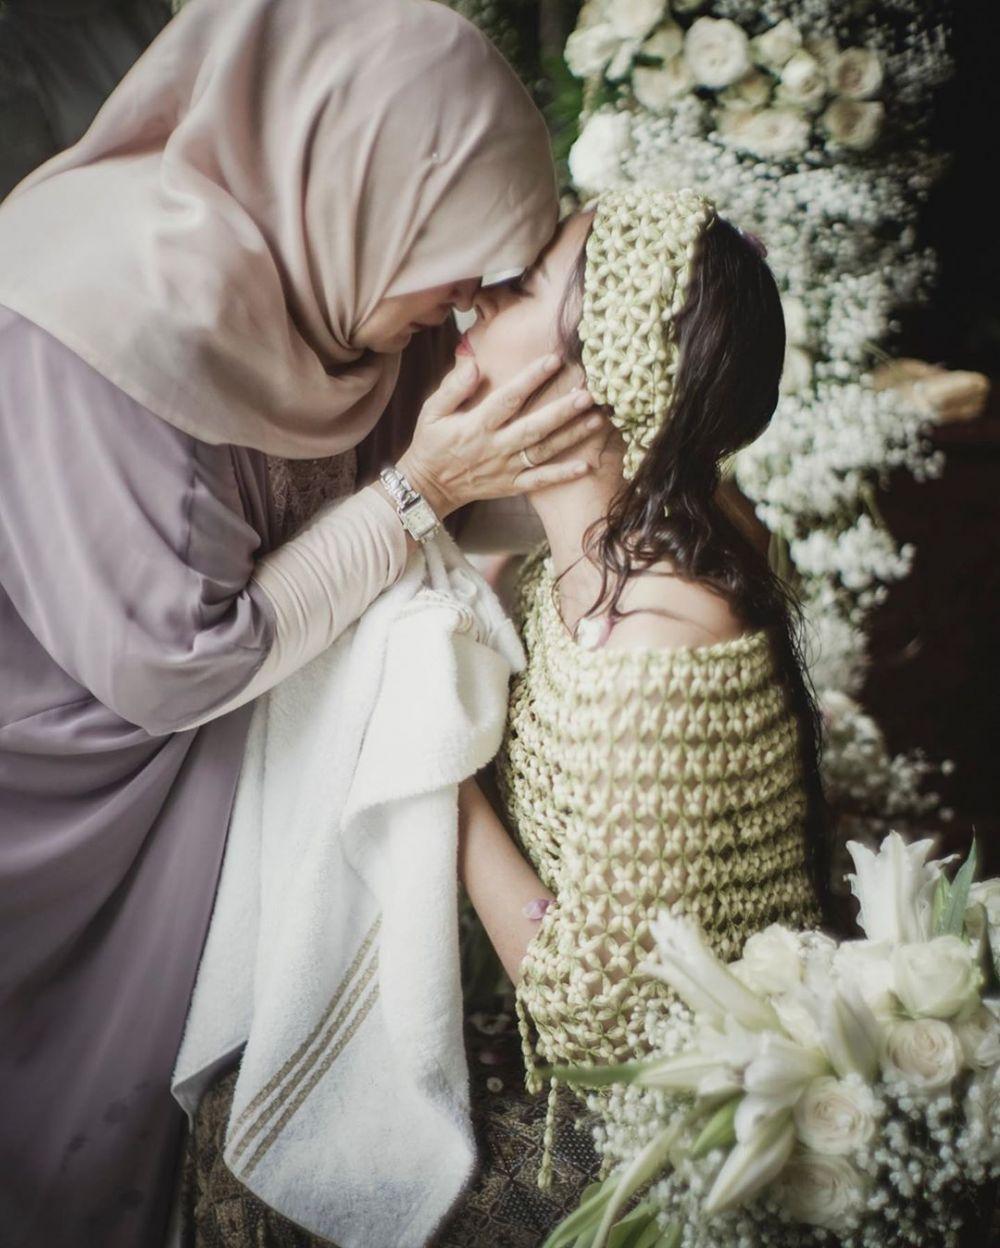 Unggahan seleb cantik Hari Ibu Instagram